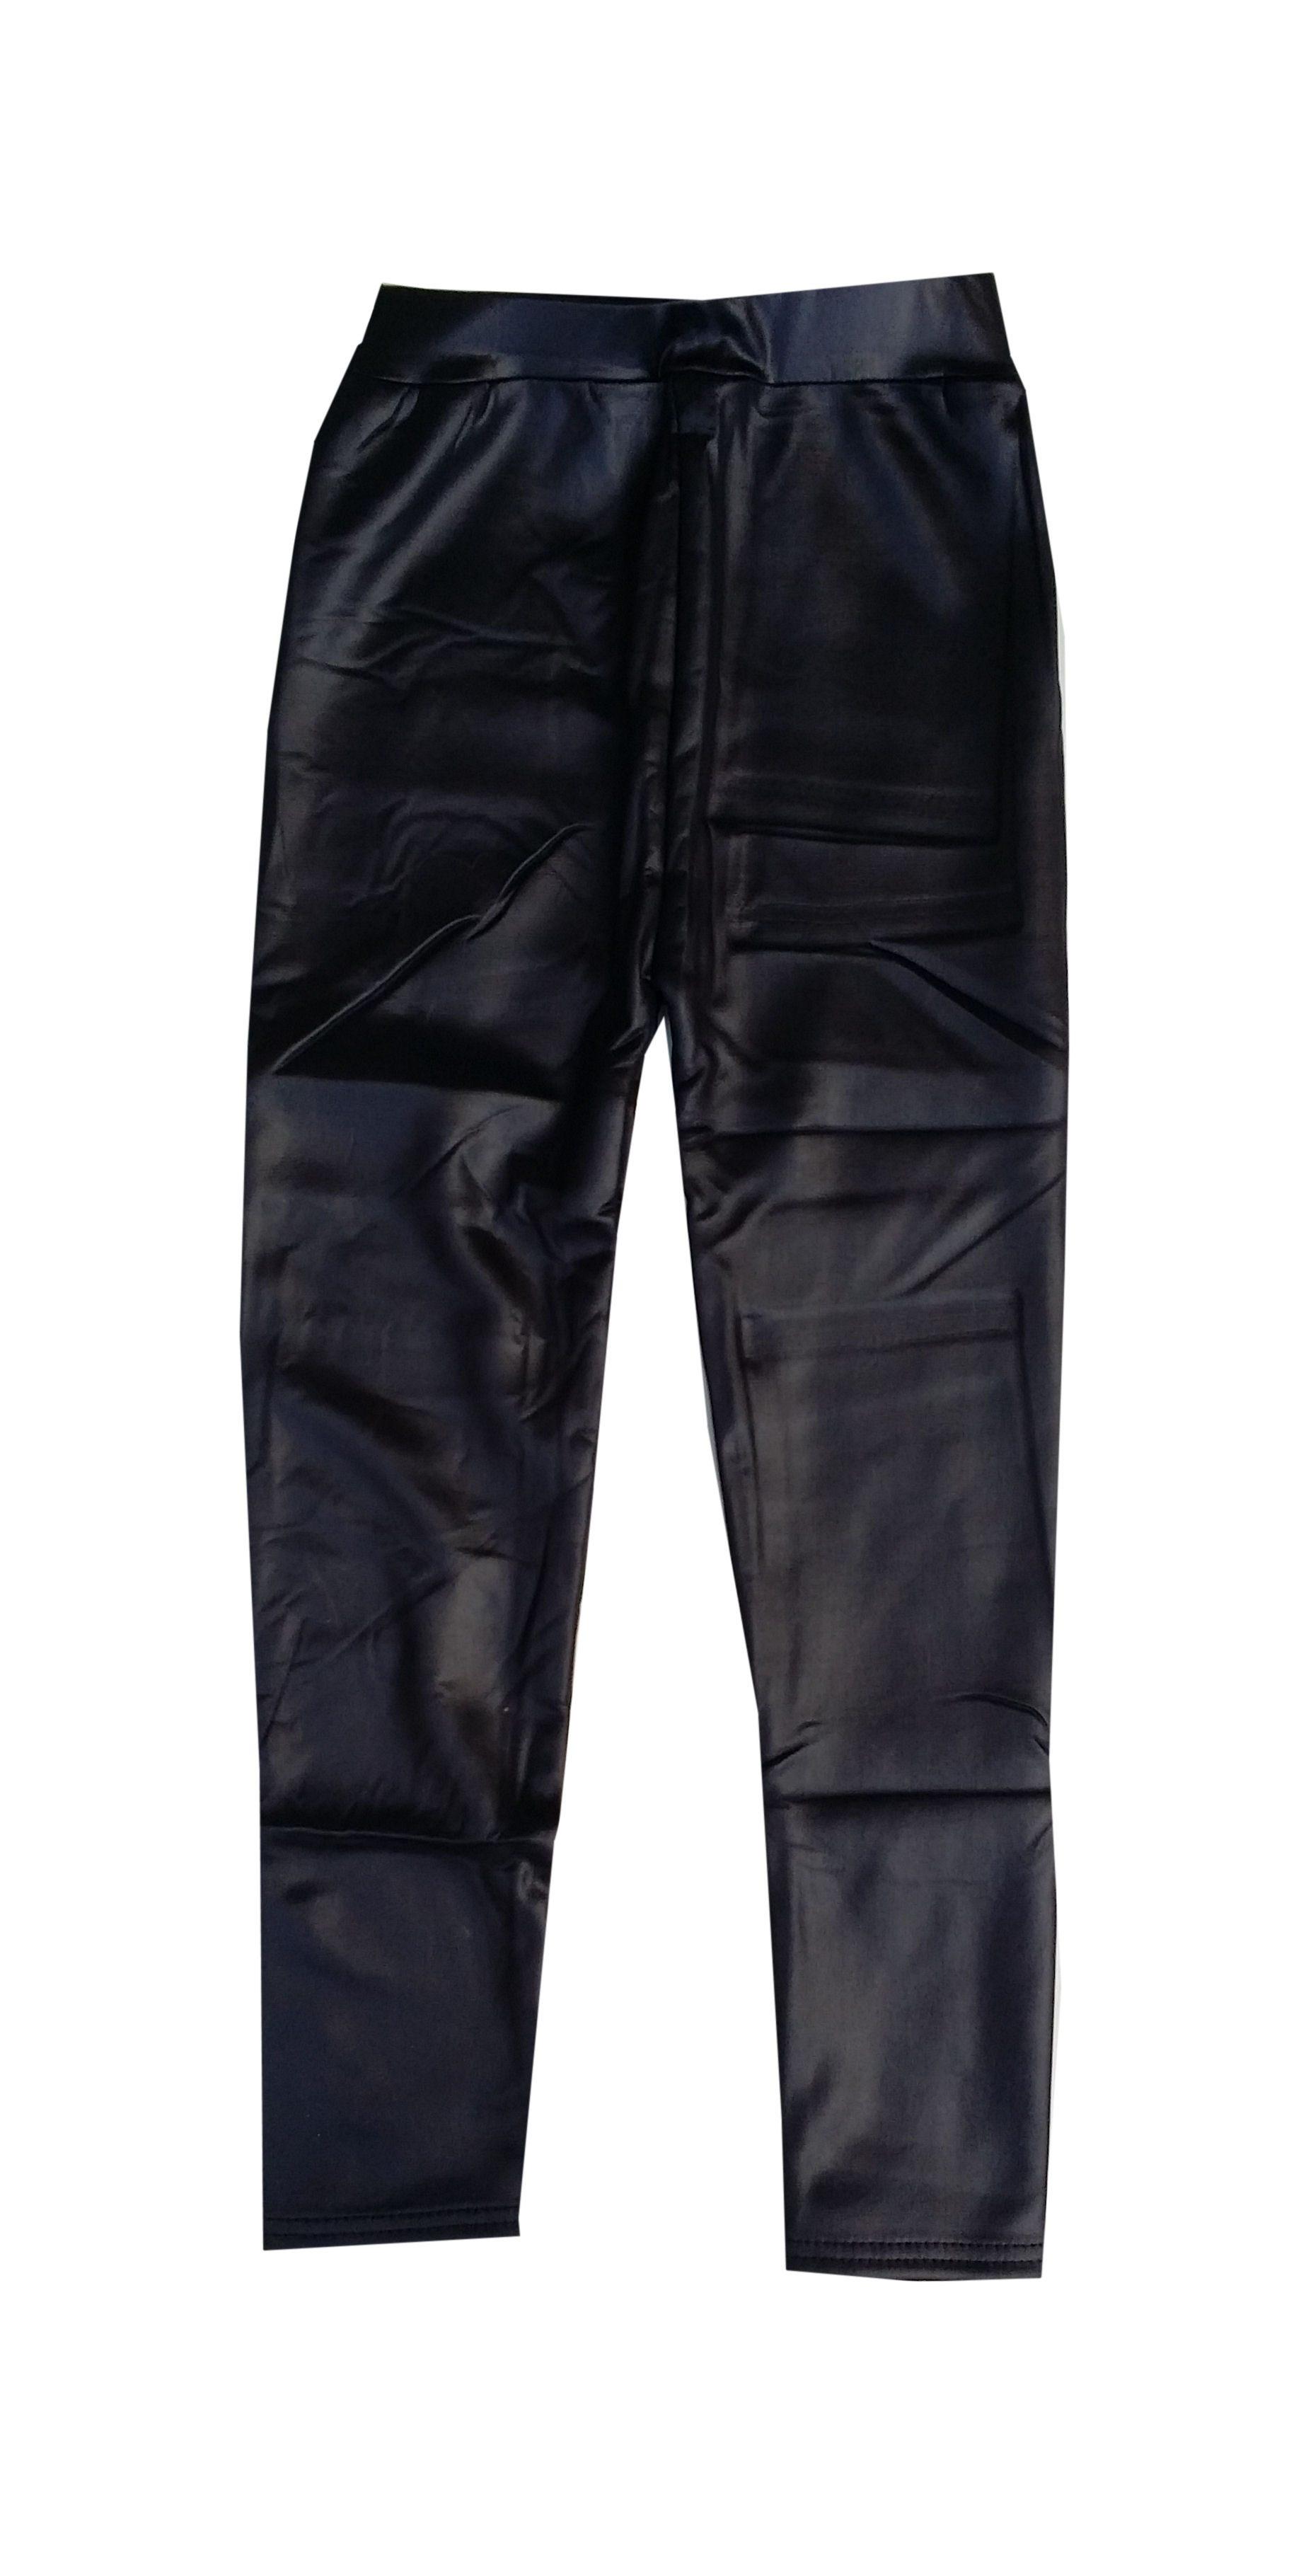 zwarte leatherlook legging gevoerd